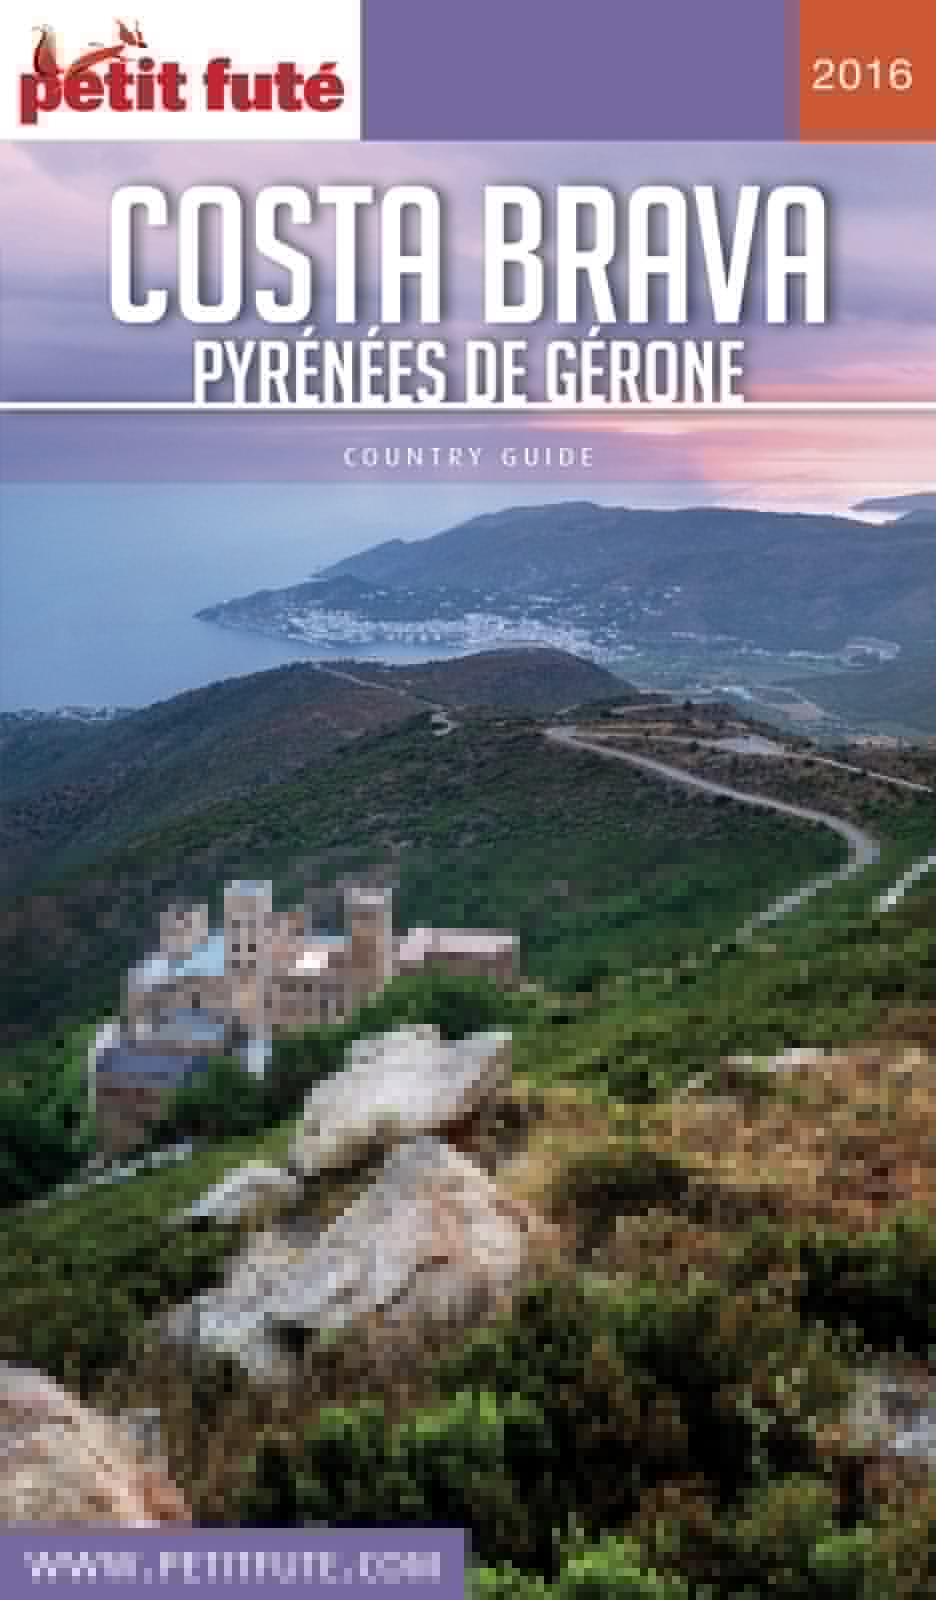 Costa Brava. Pyrénées de Gérone 2017 Petit Futé